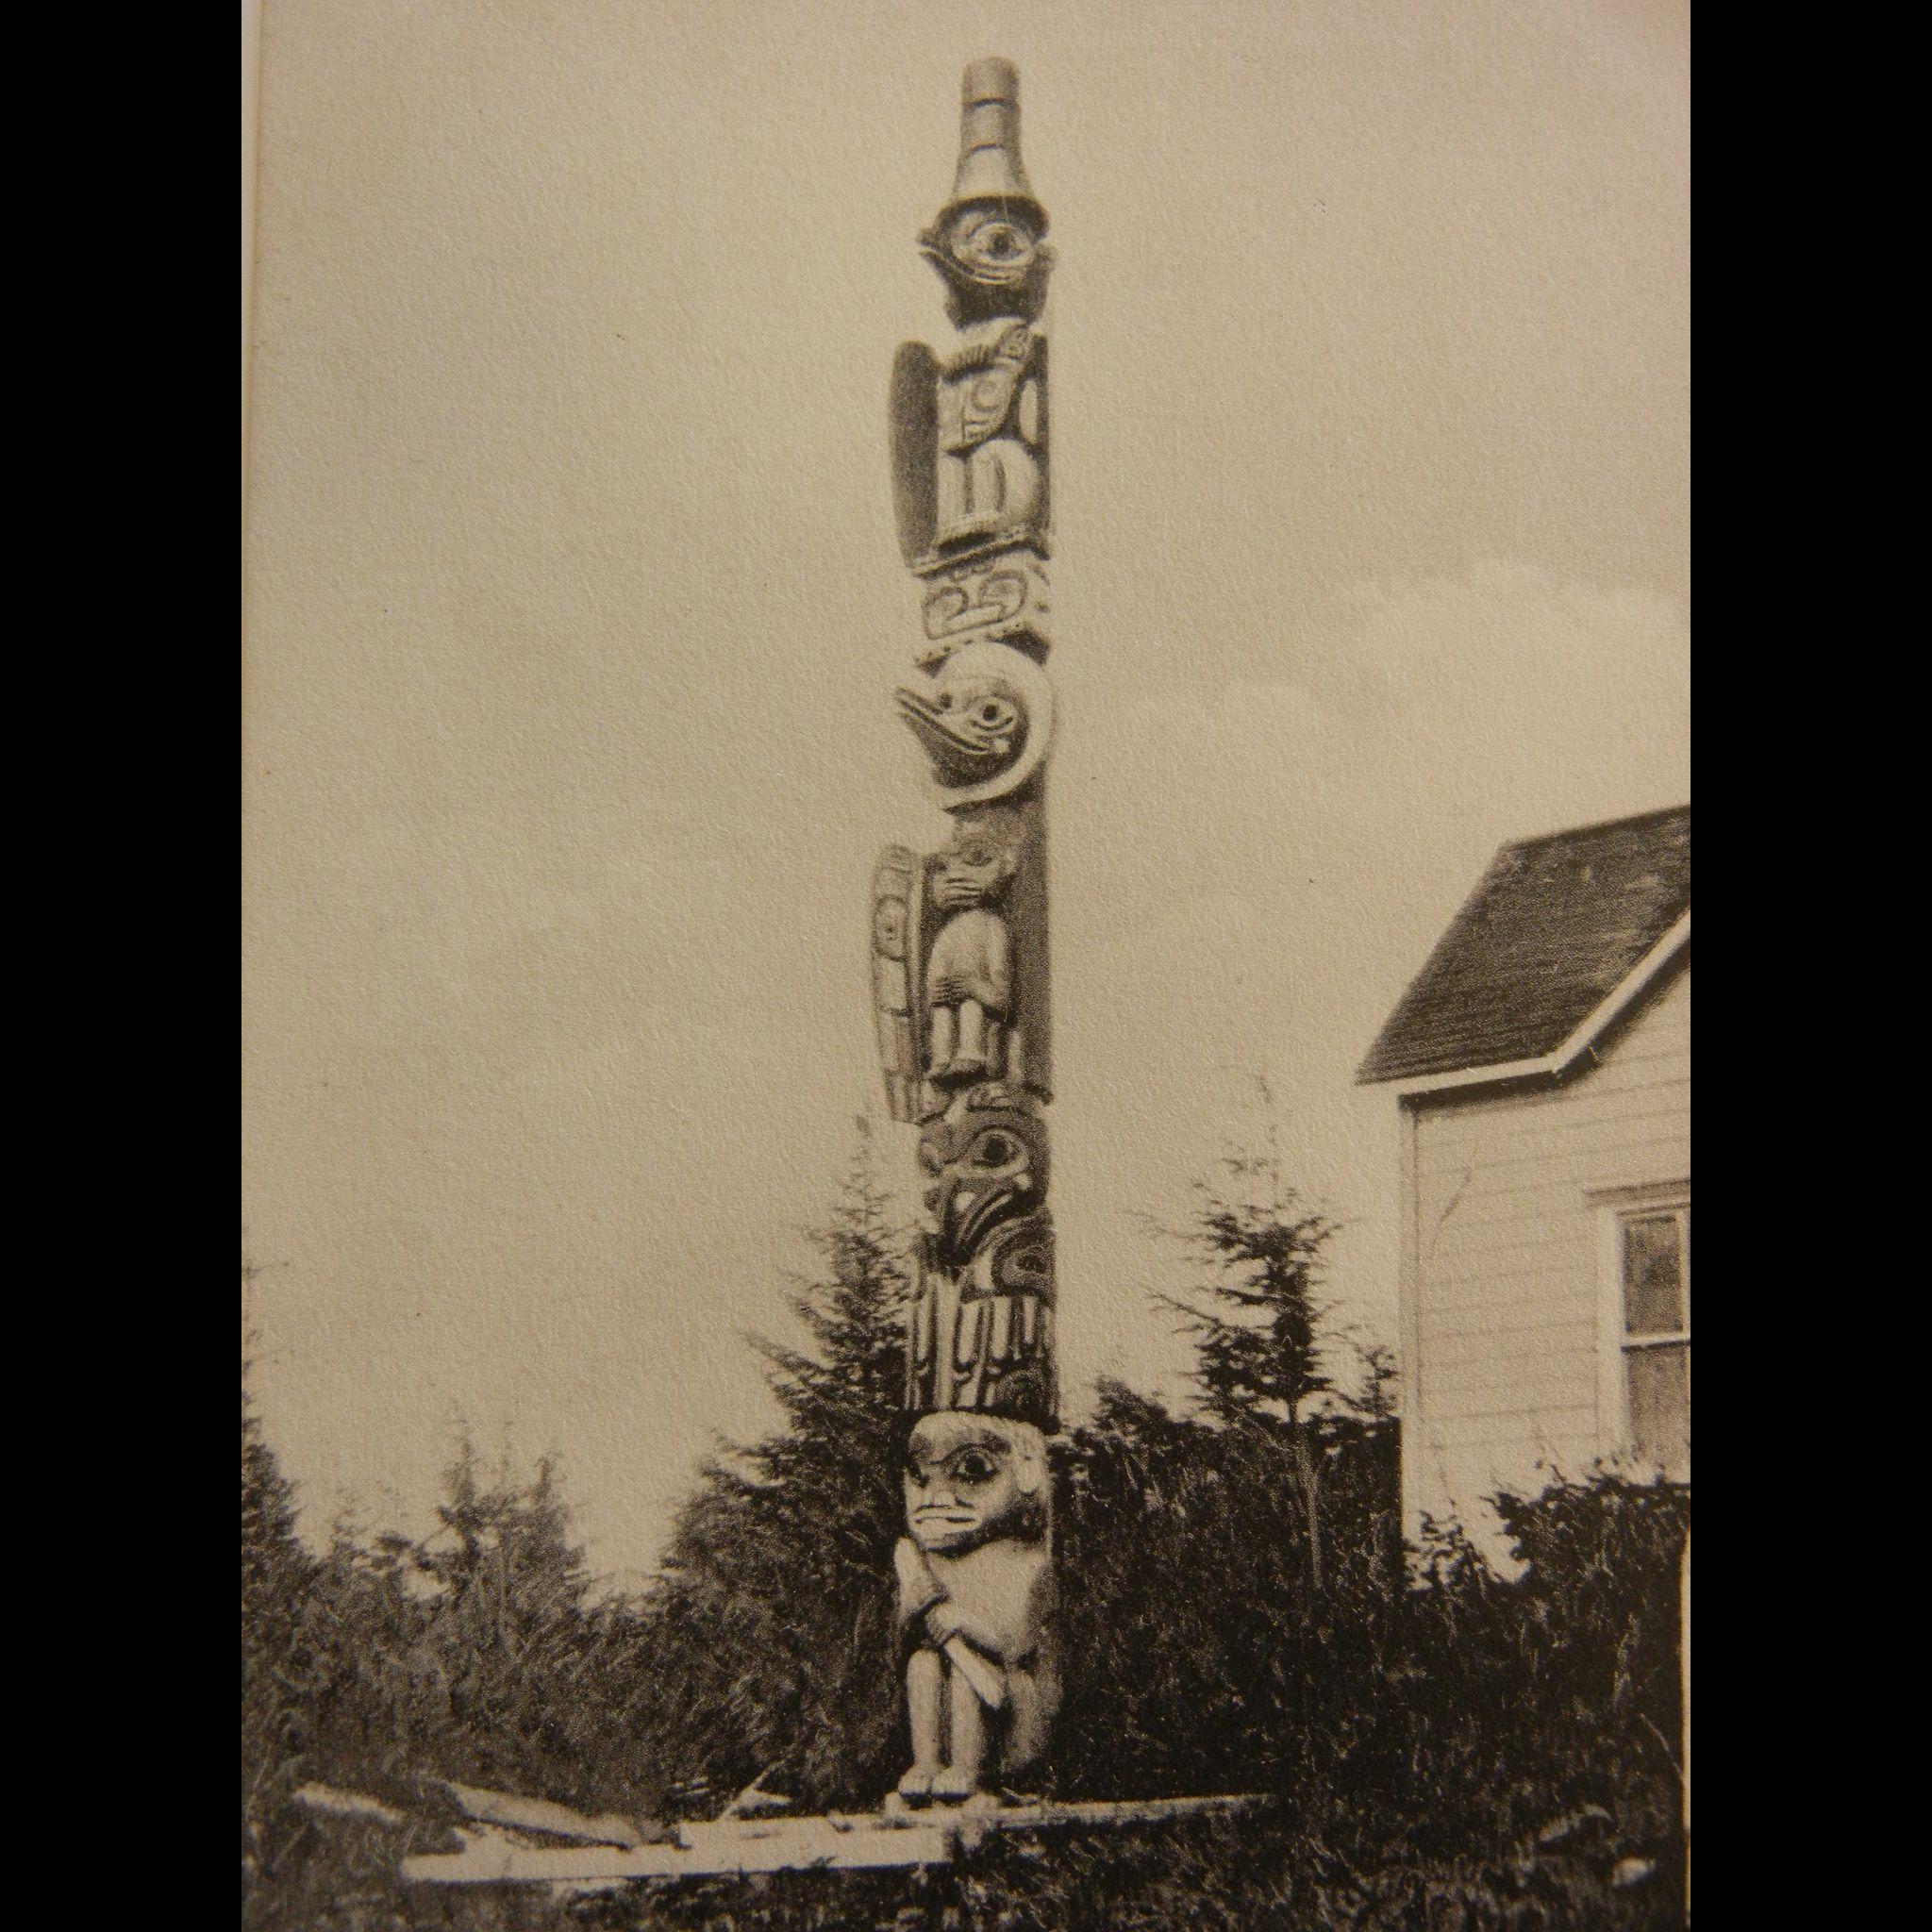 Vintage Original Photograph Postcard of Totem Pole at Wrangle, Alaska